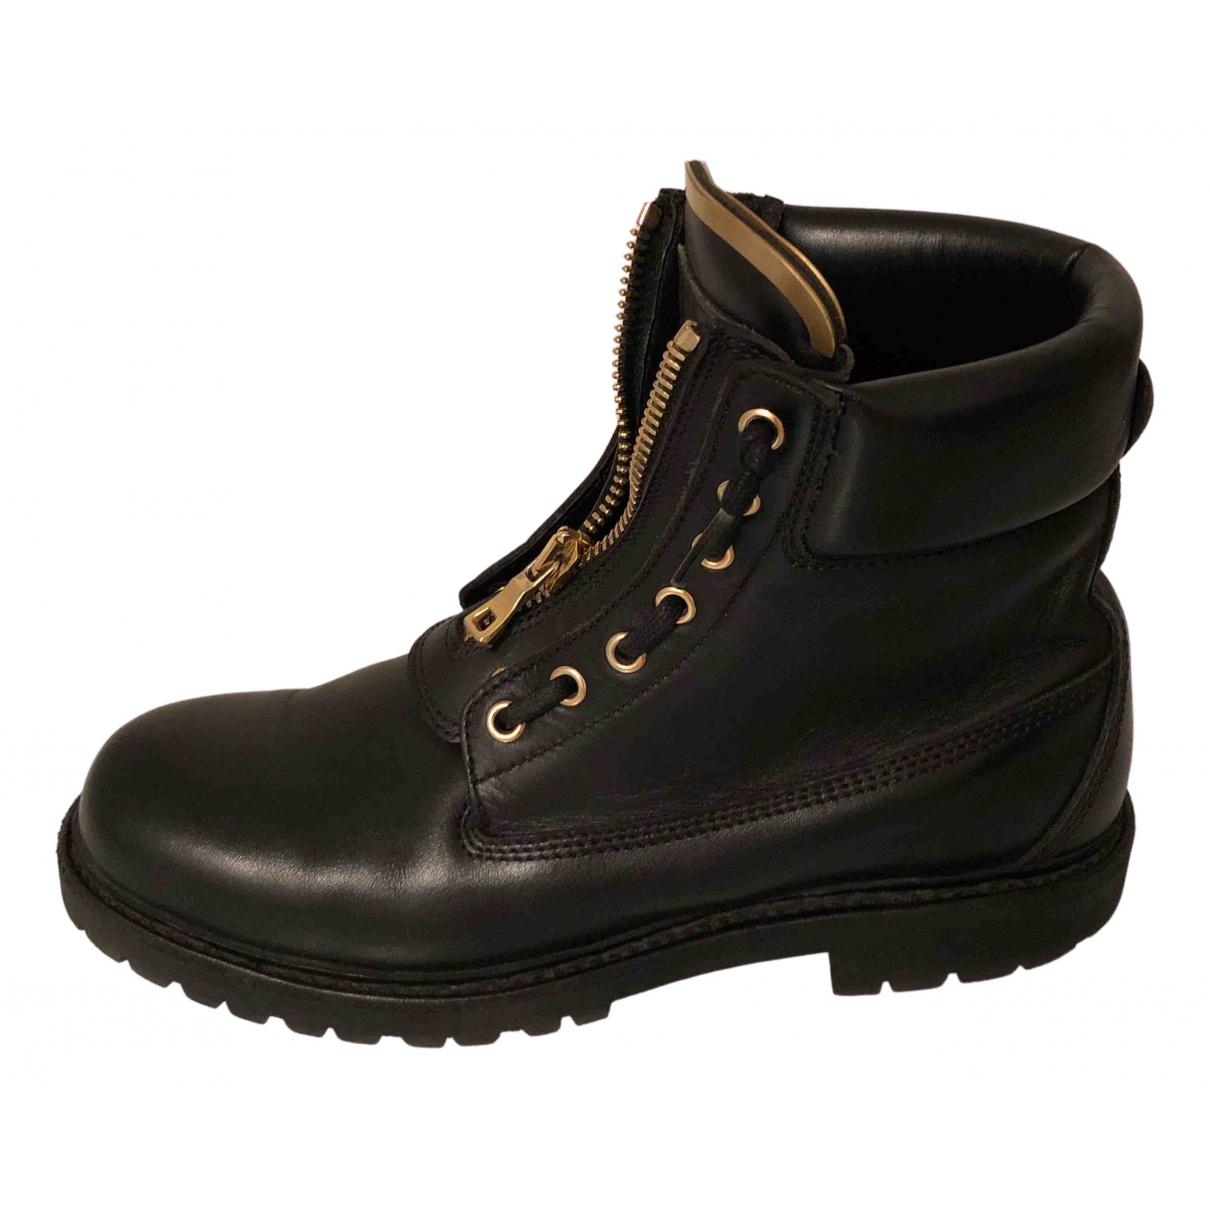 Balmain N Black Leather Ankle boots for Women 41 EU